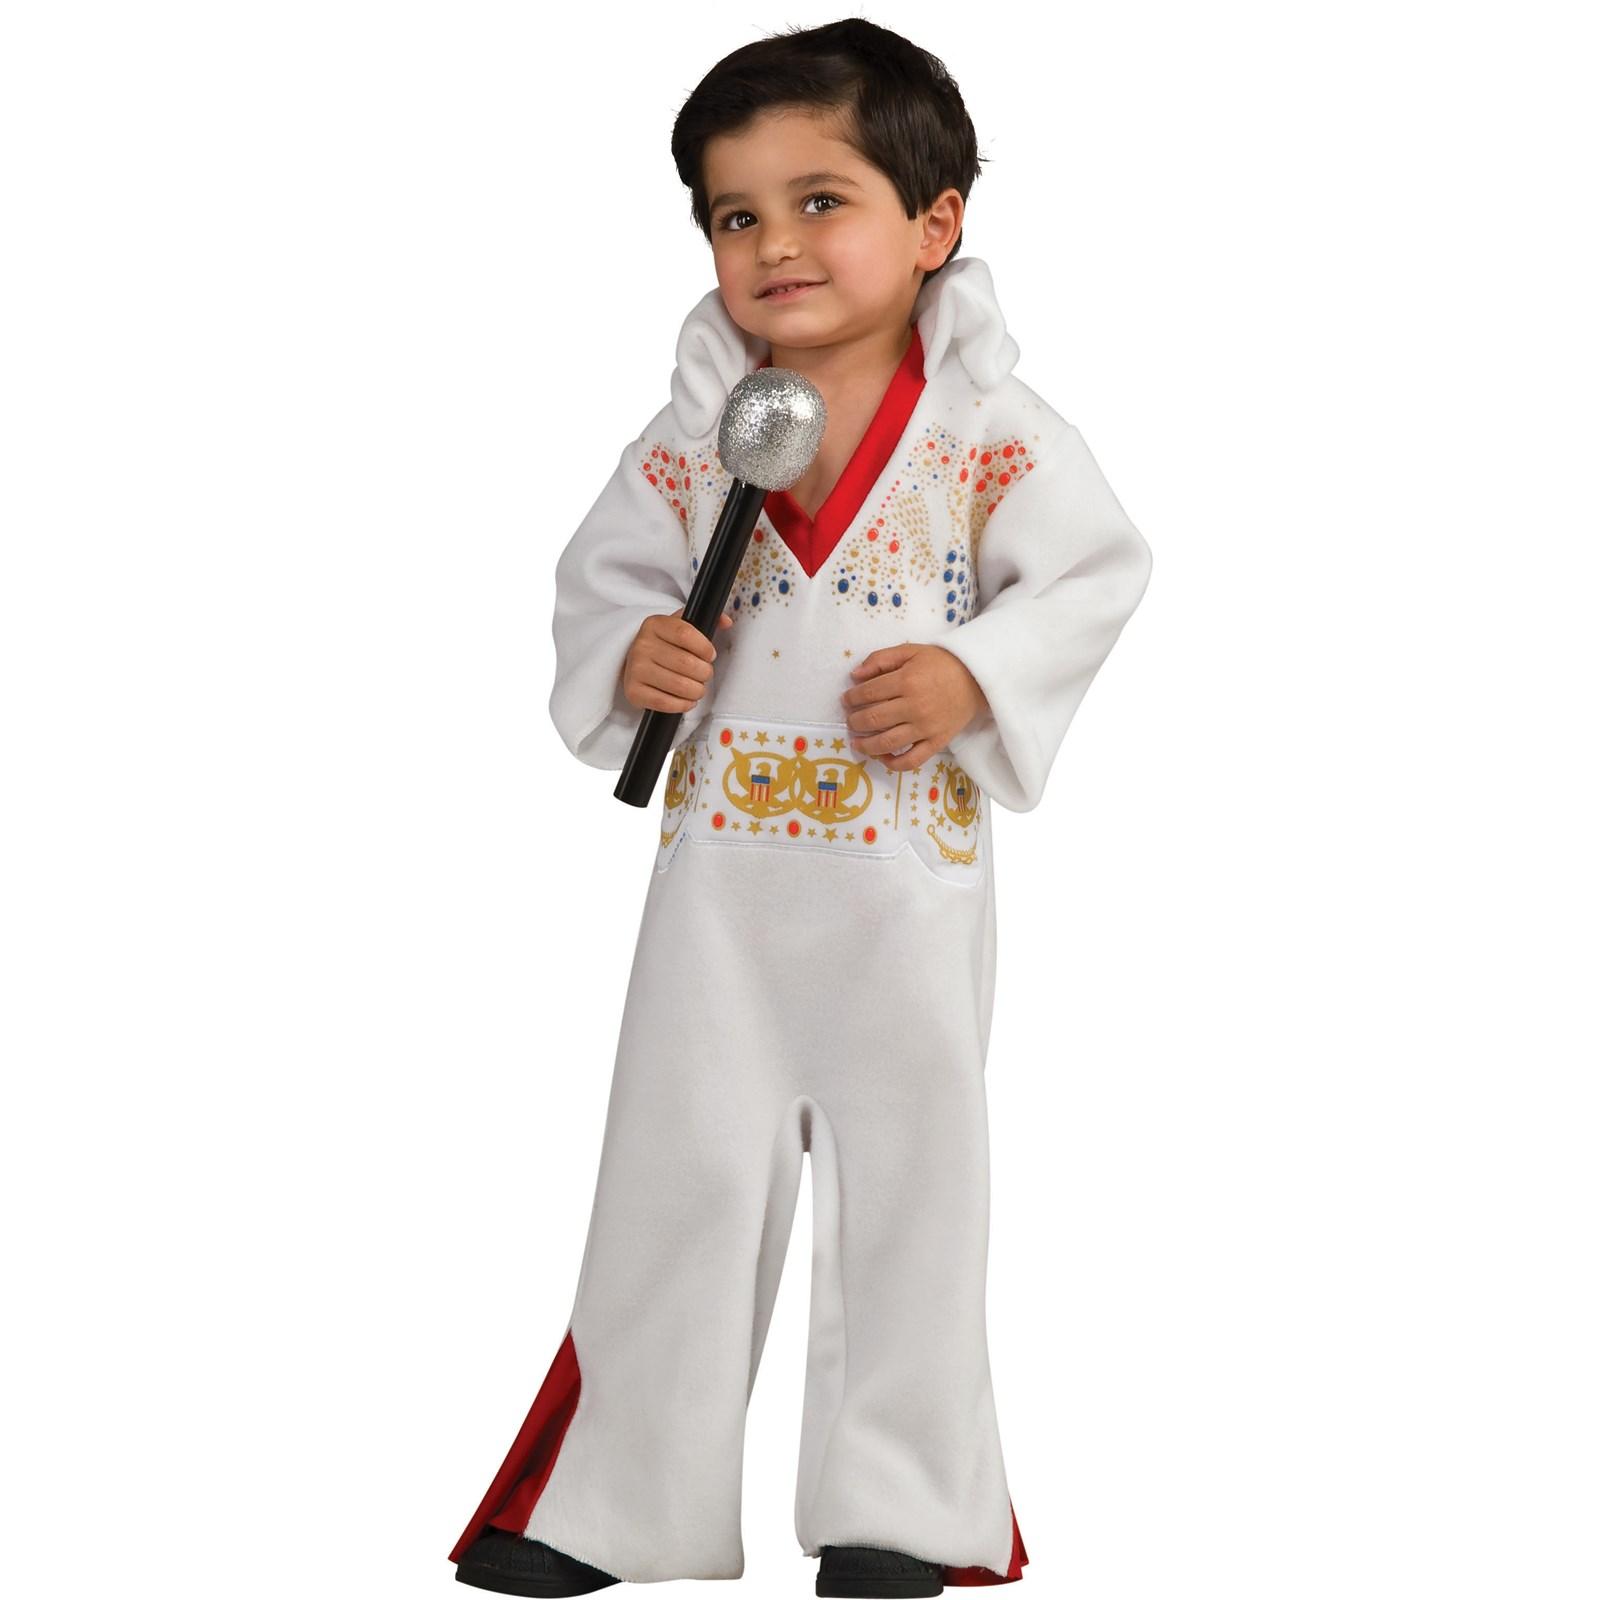 Elvis Party Decorations For Sale